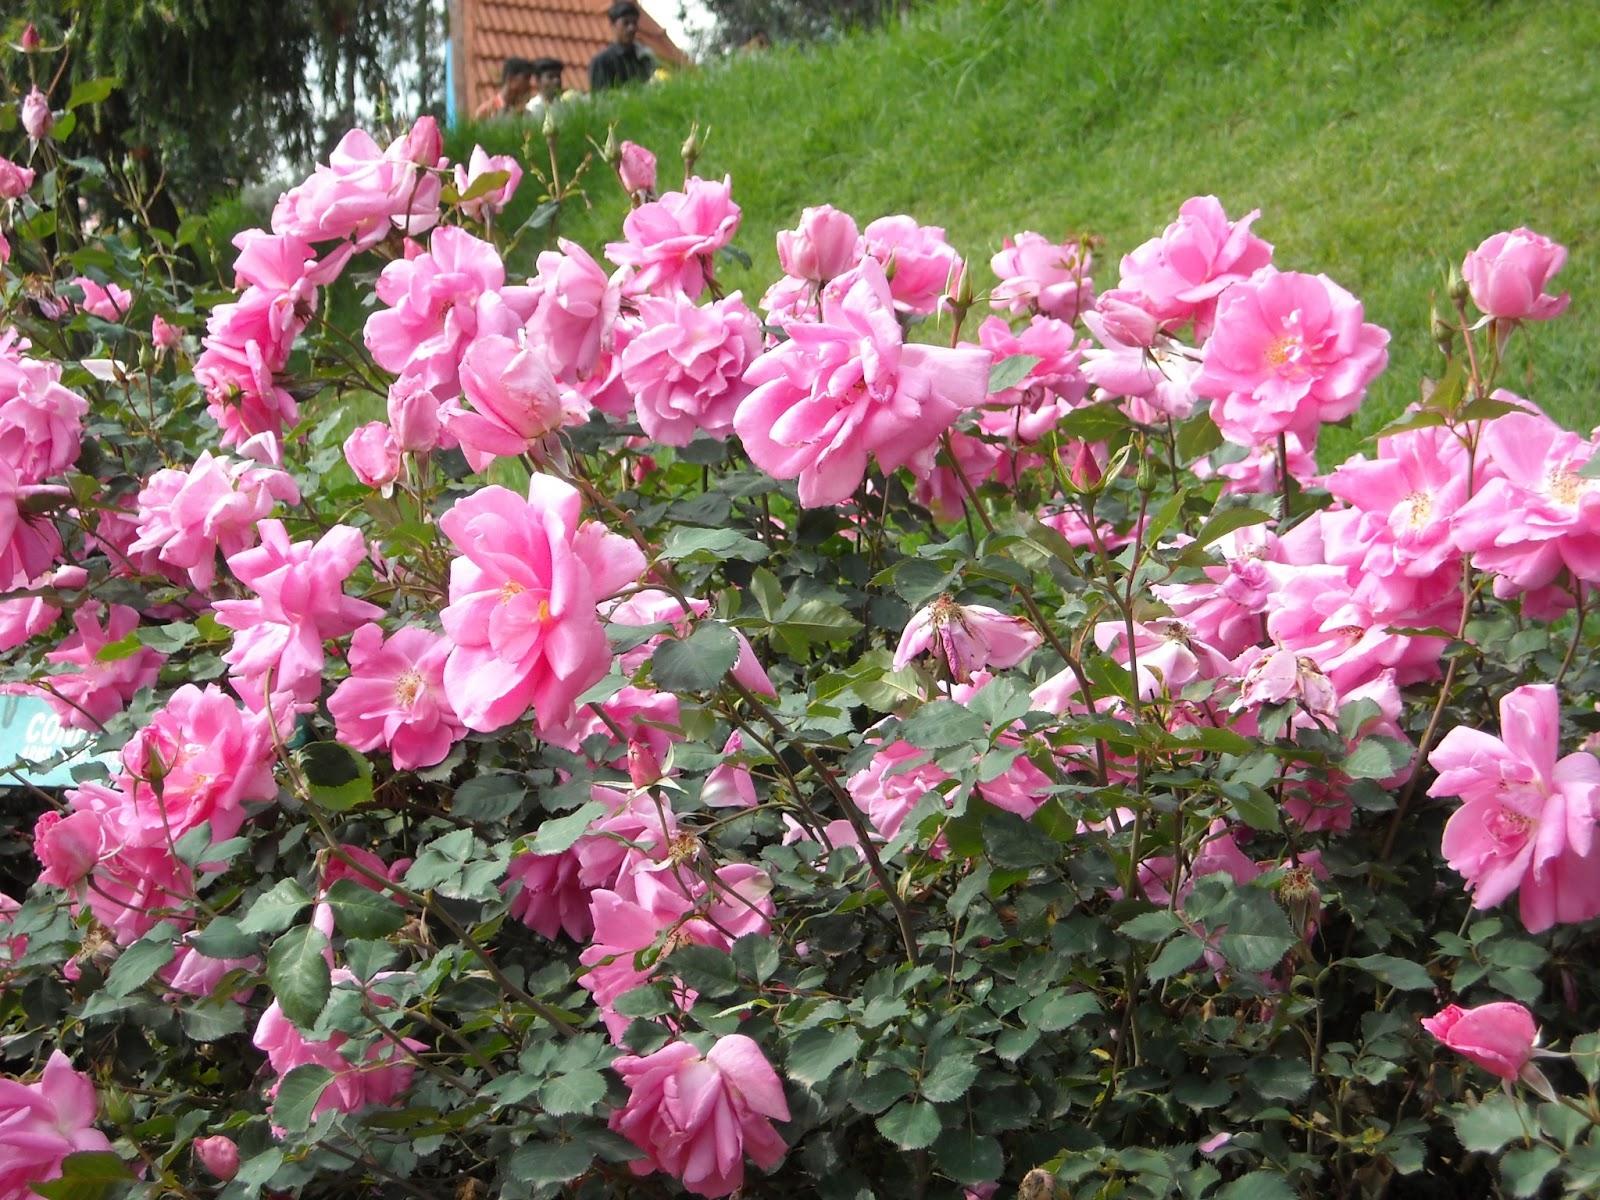 Roses In Garden: Vinodh Photography : OOTY Rose Garden